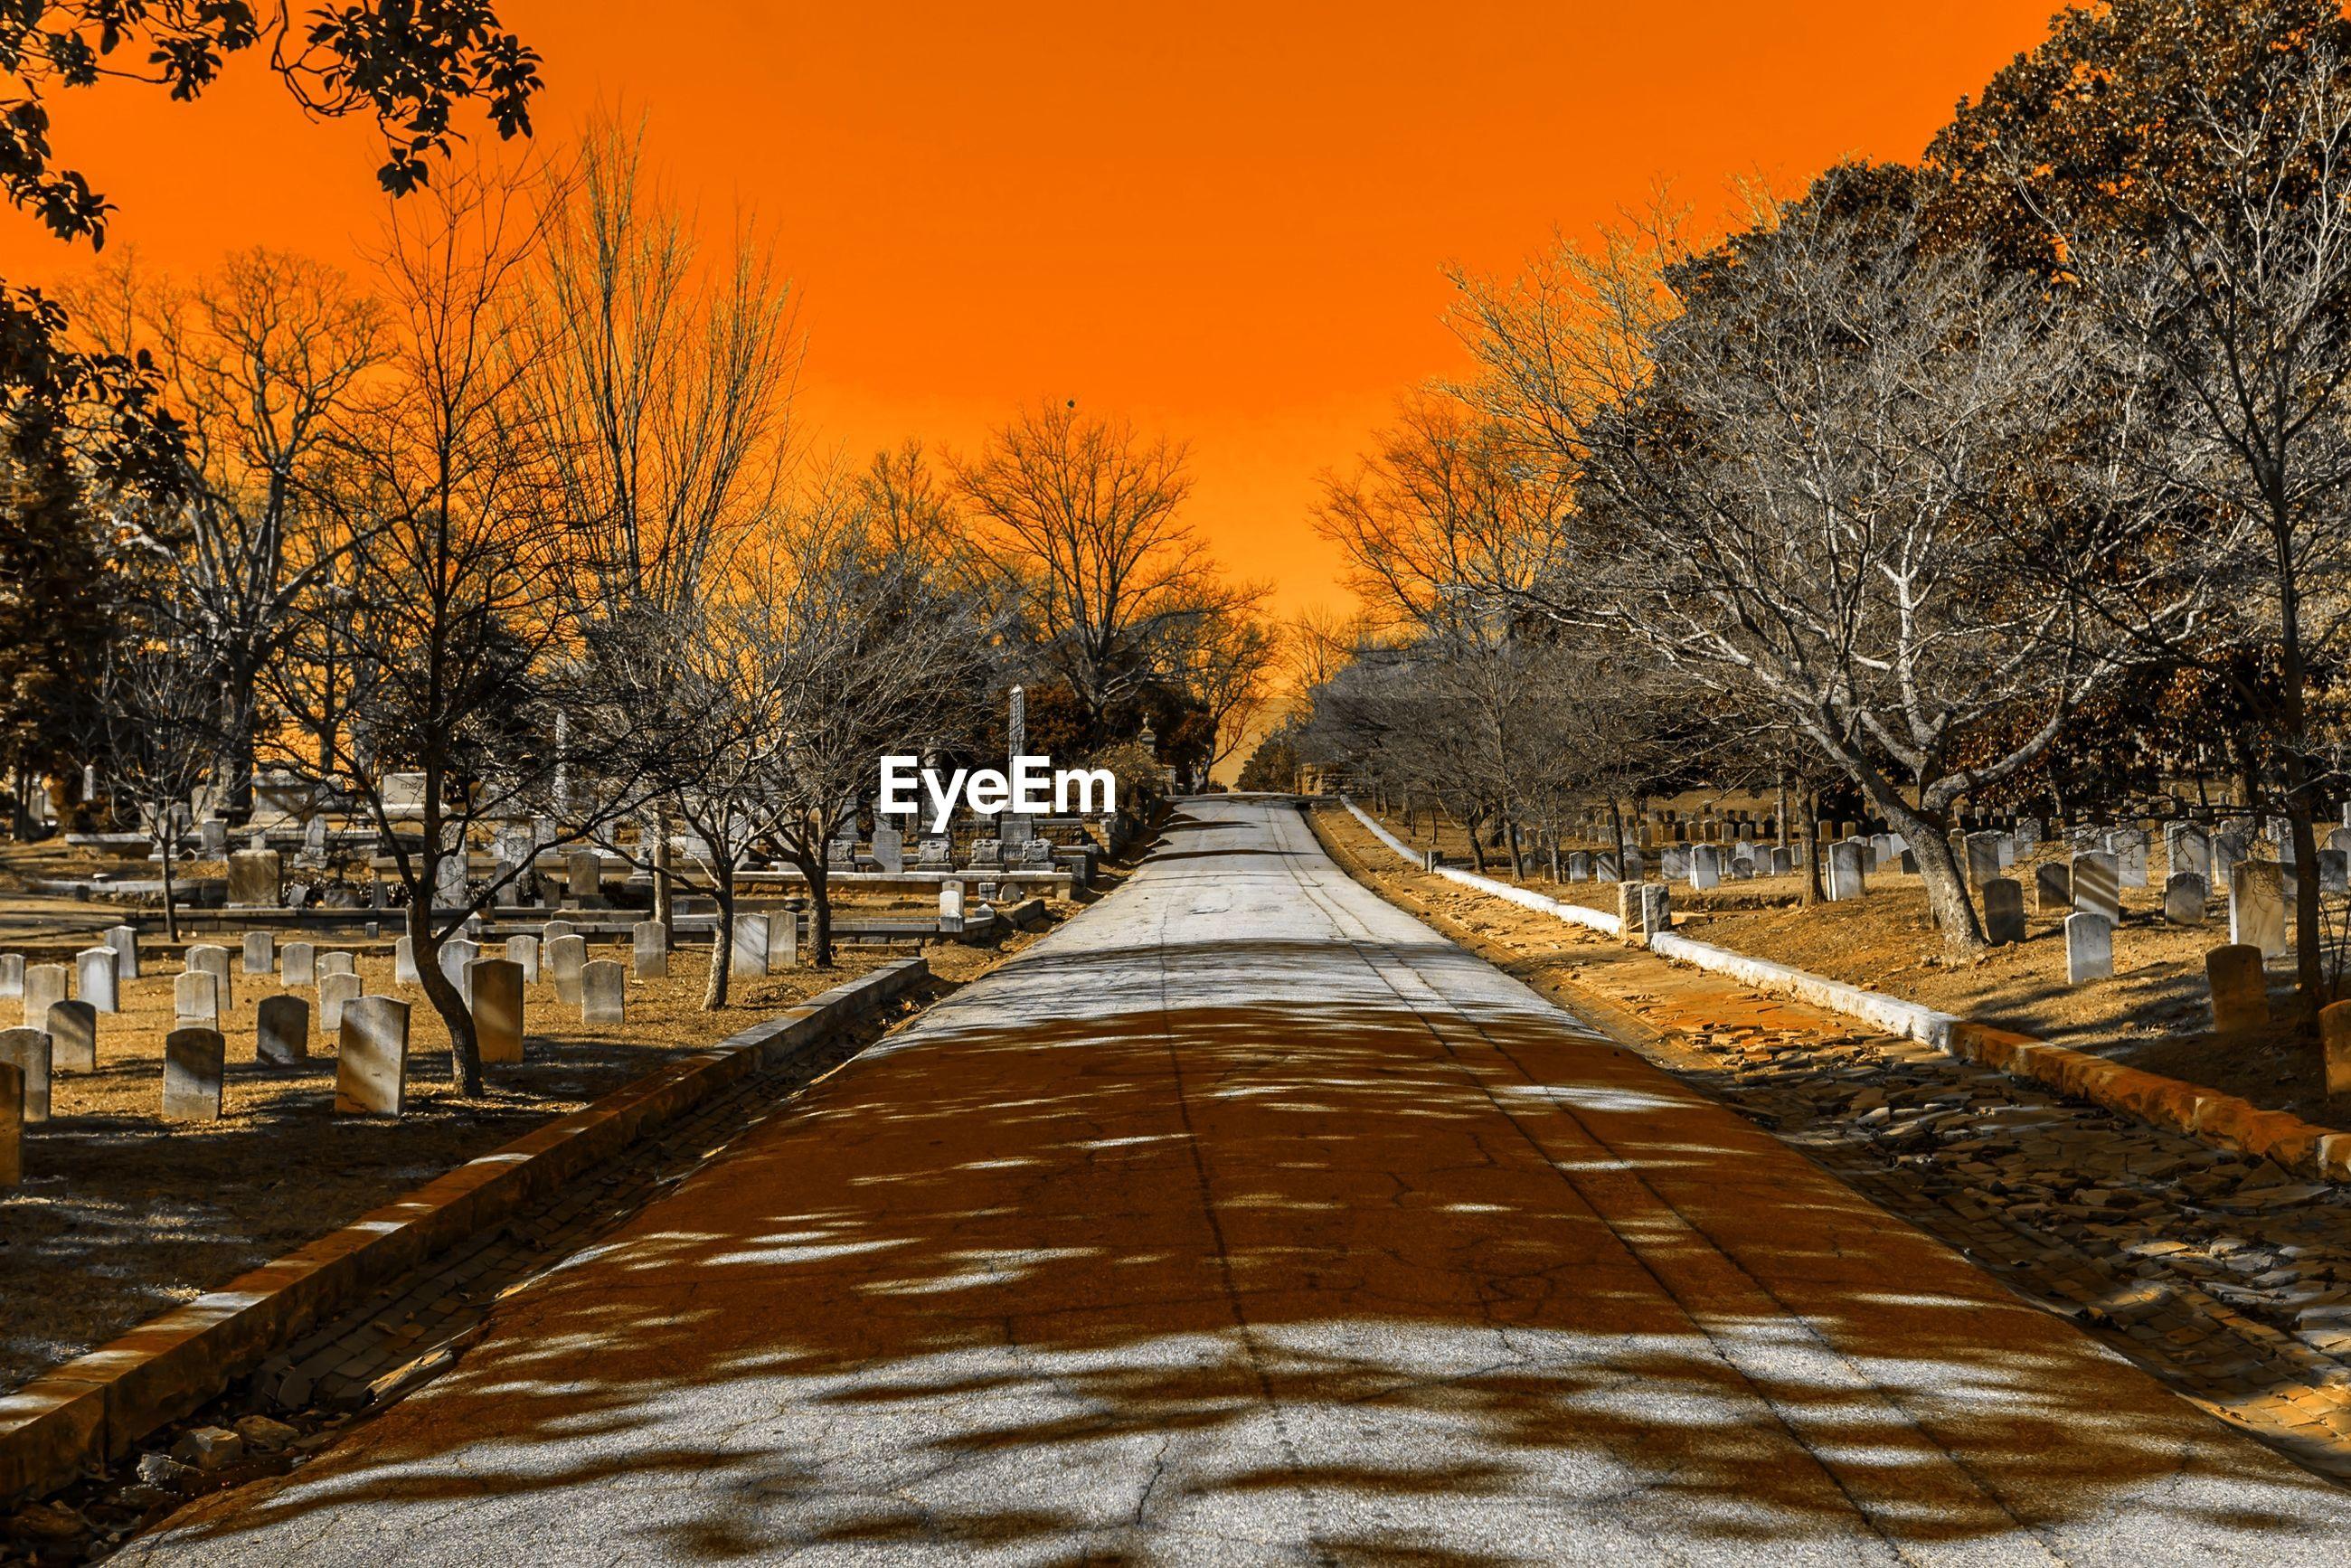 Empty footpath amidst cemetery against orange sky